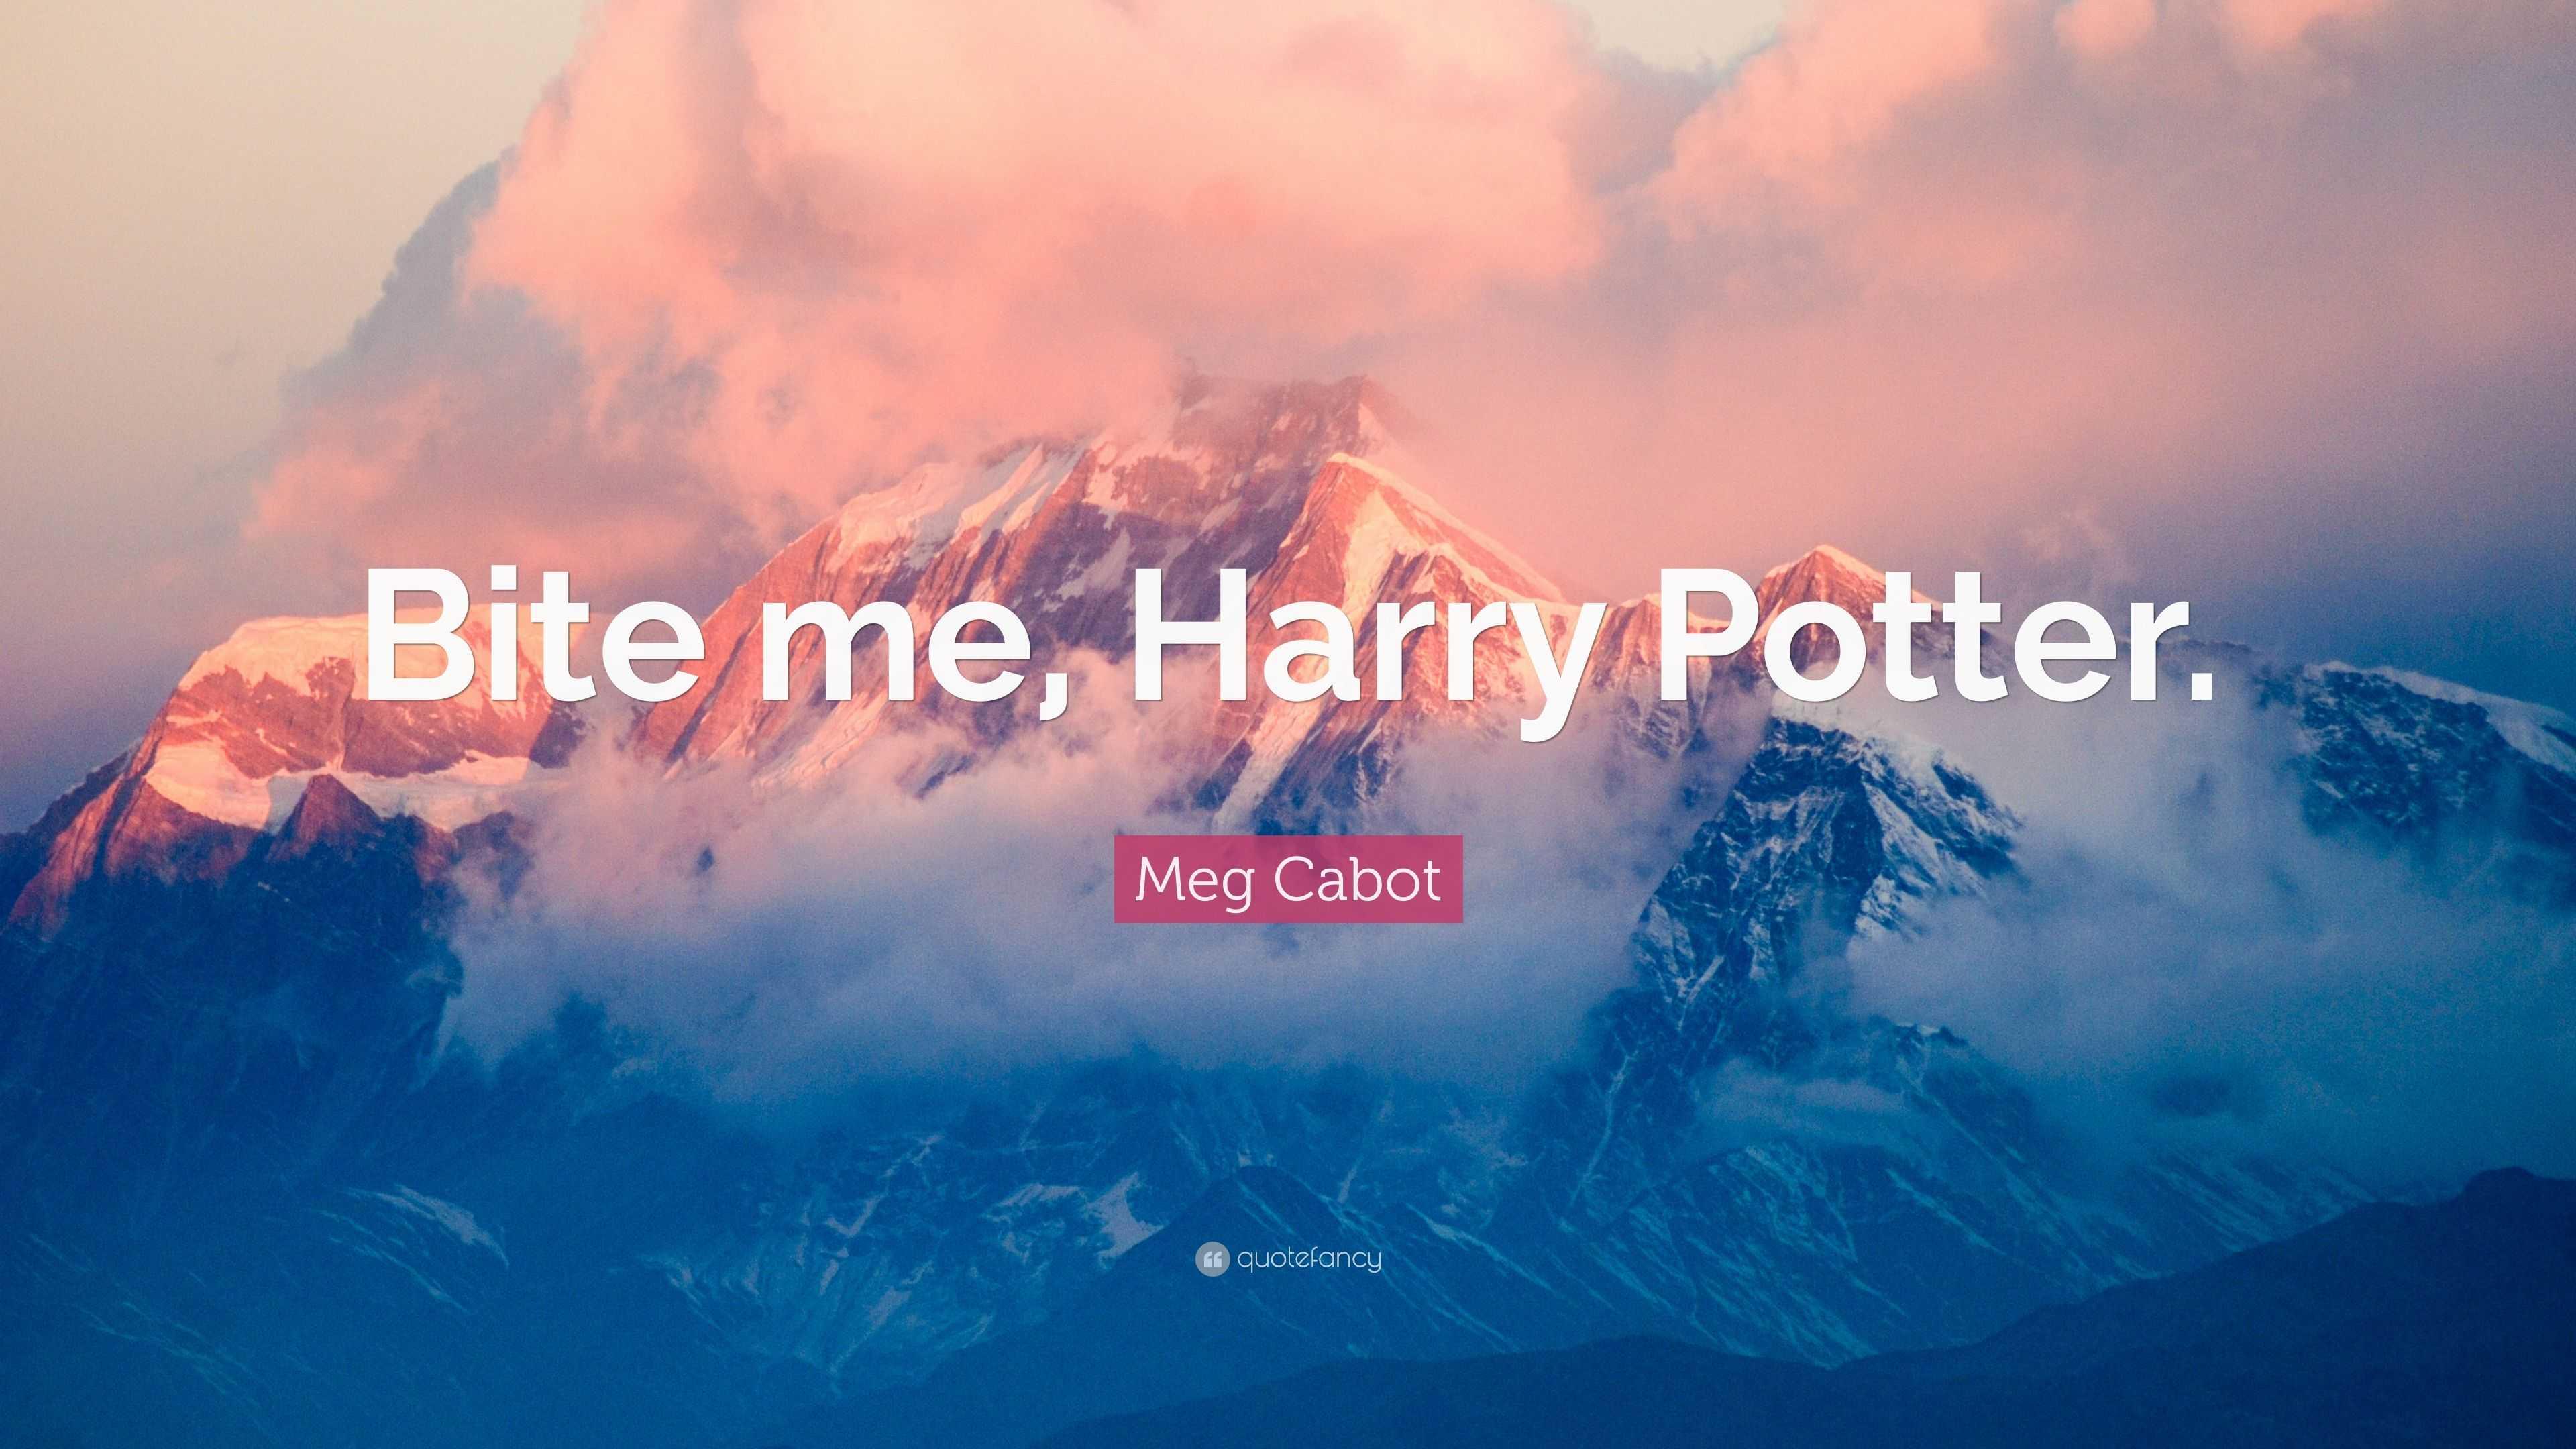 Top Wallpaper Harry Potter Pink - 3793044-Meg-Cabot-Quote-Bite-me-Harry-Potter  Snapshot_17708.jpg